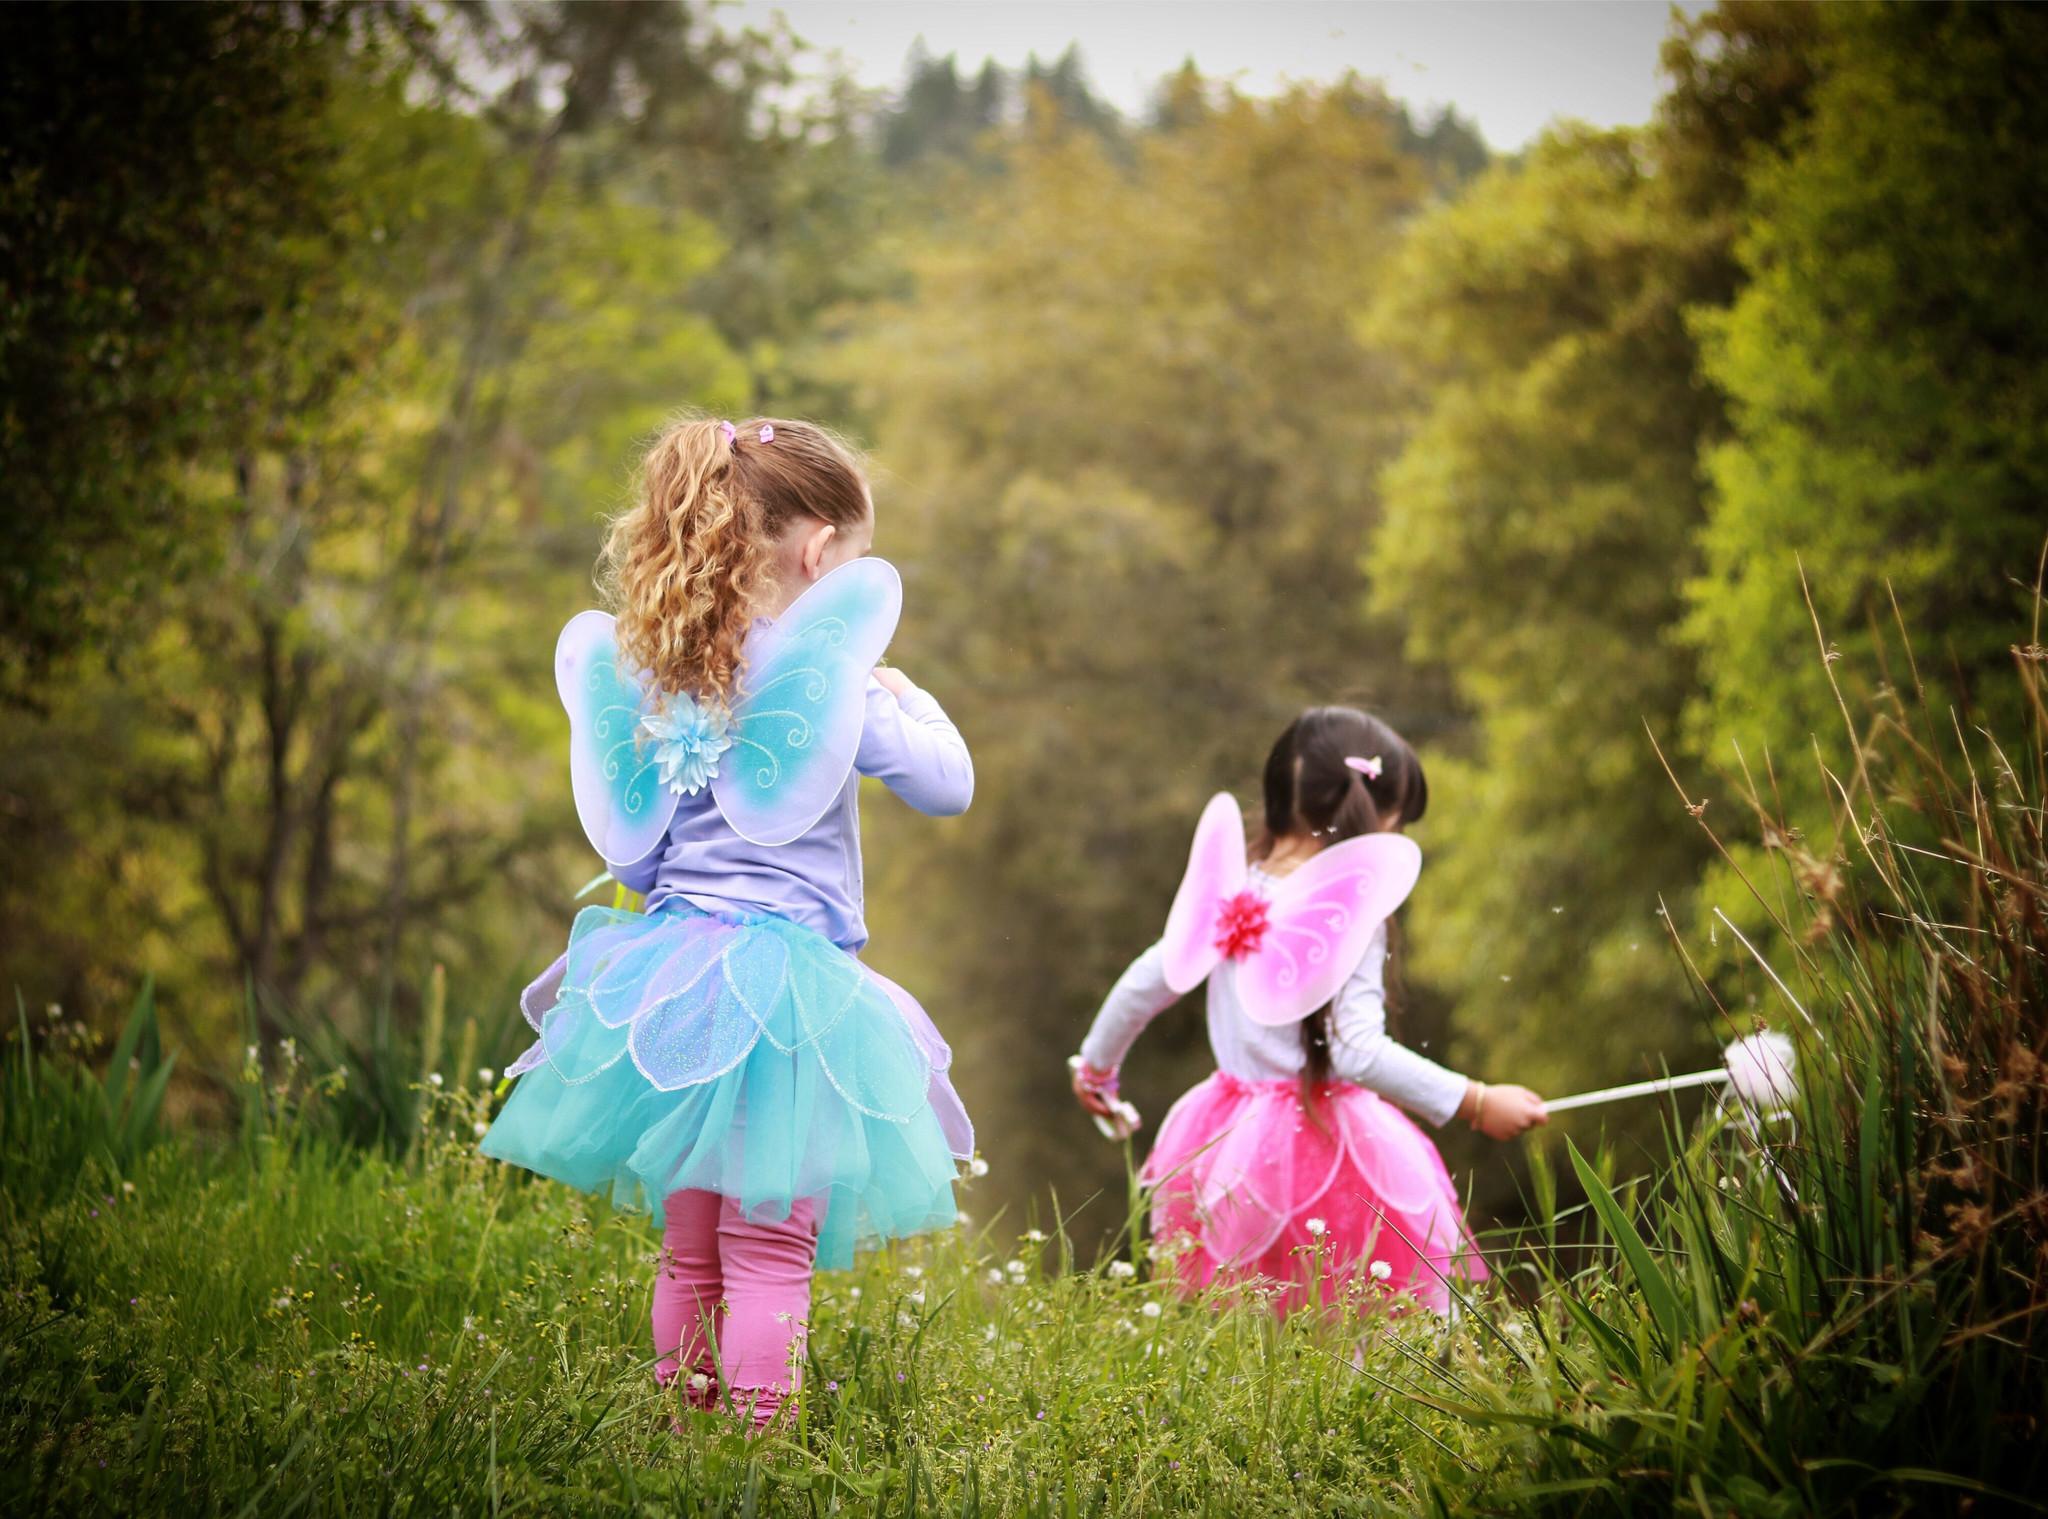 The 5 Developmental Benefits of Dress-Up Pretend Play